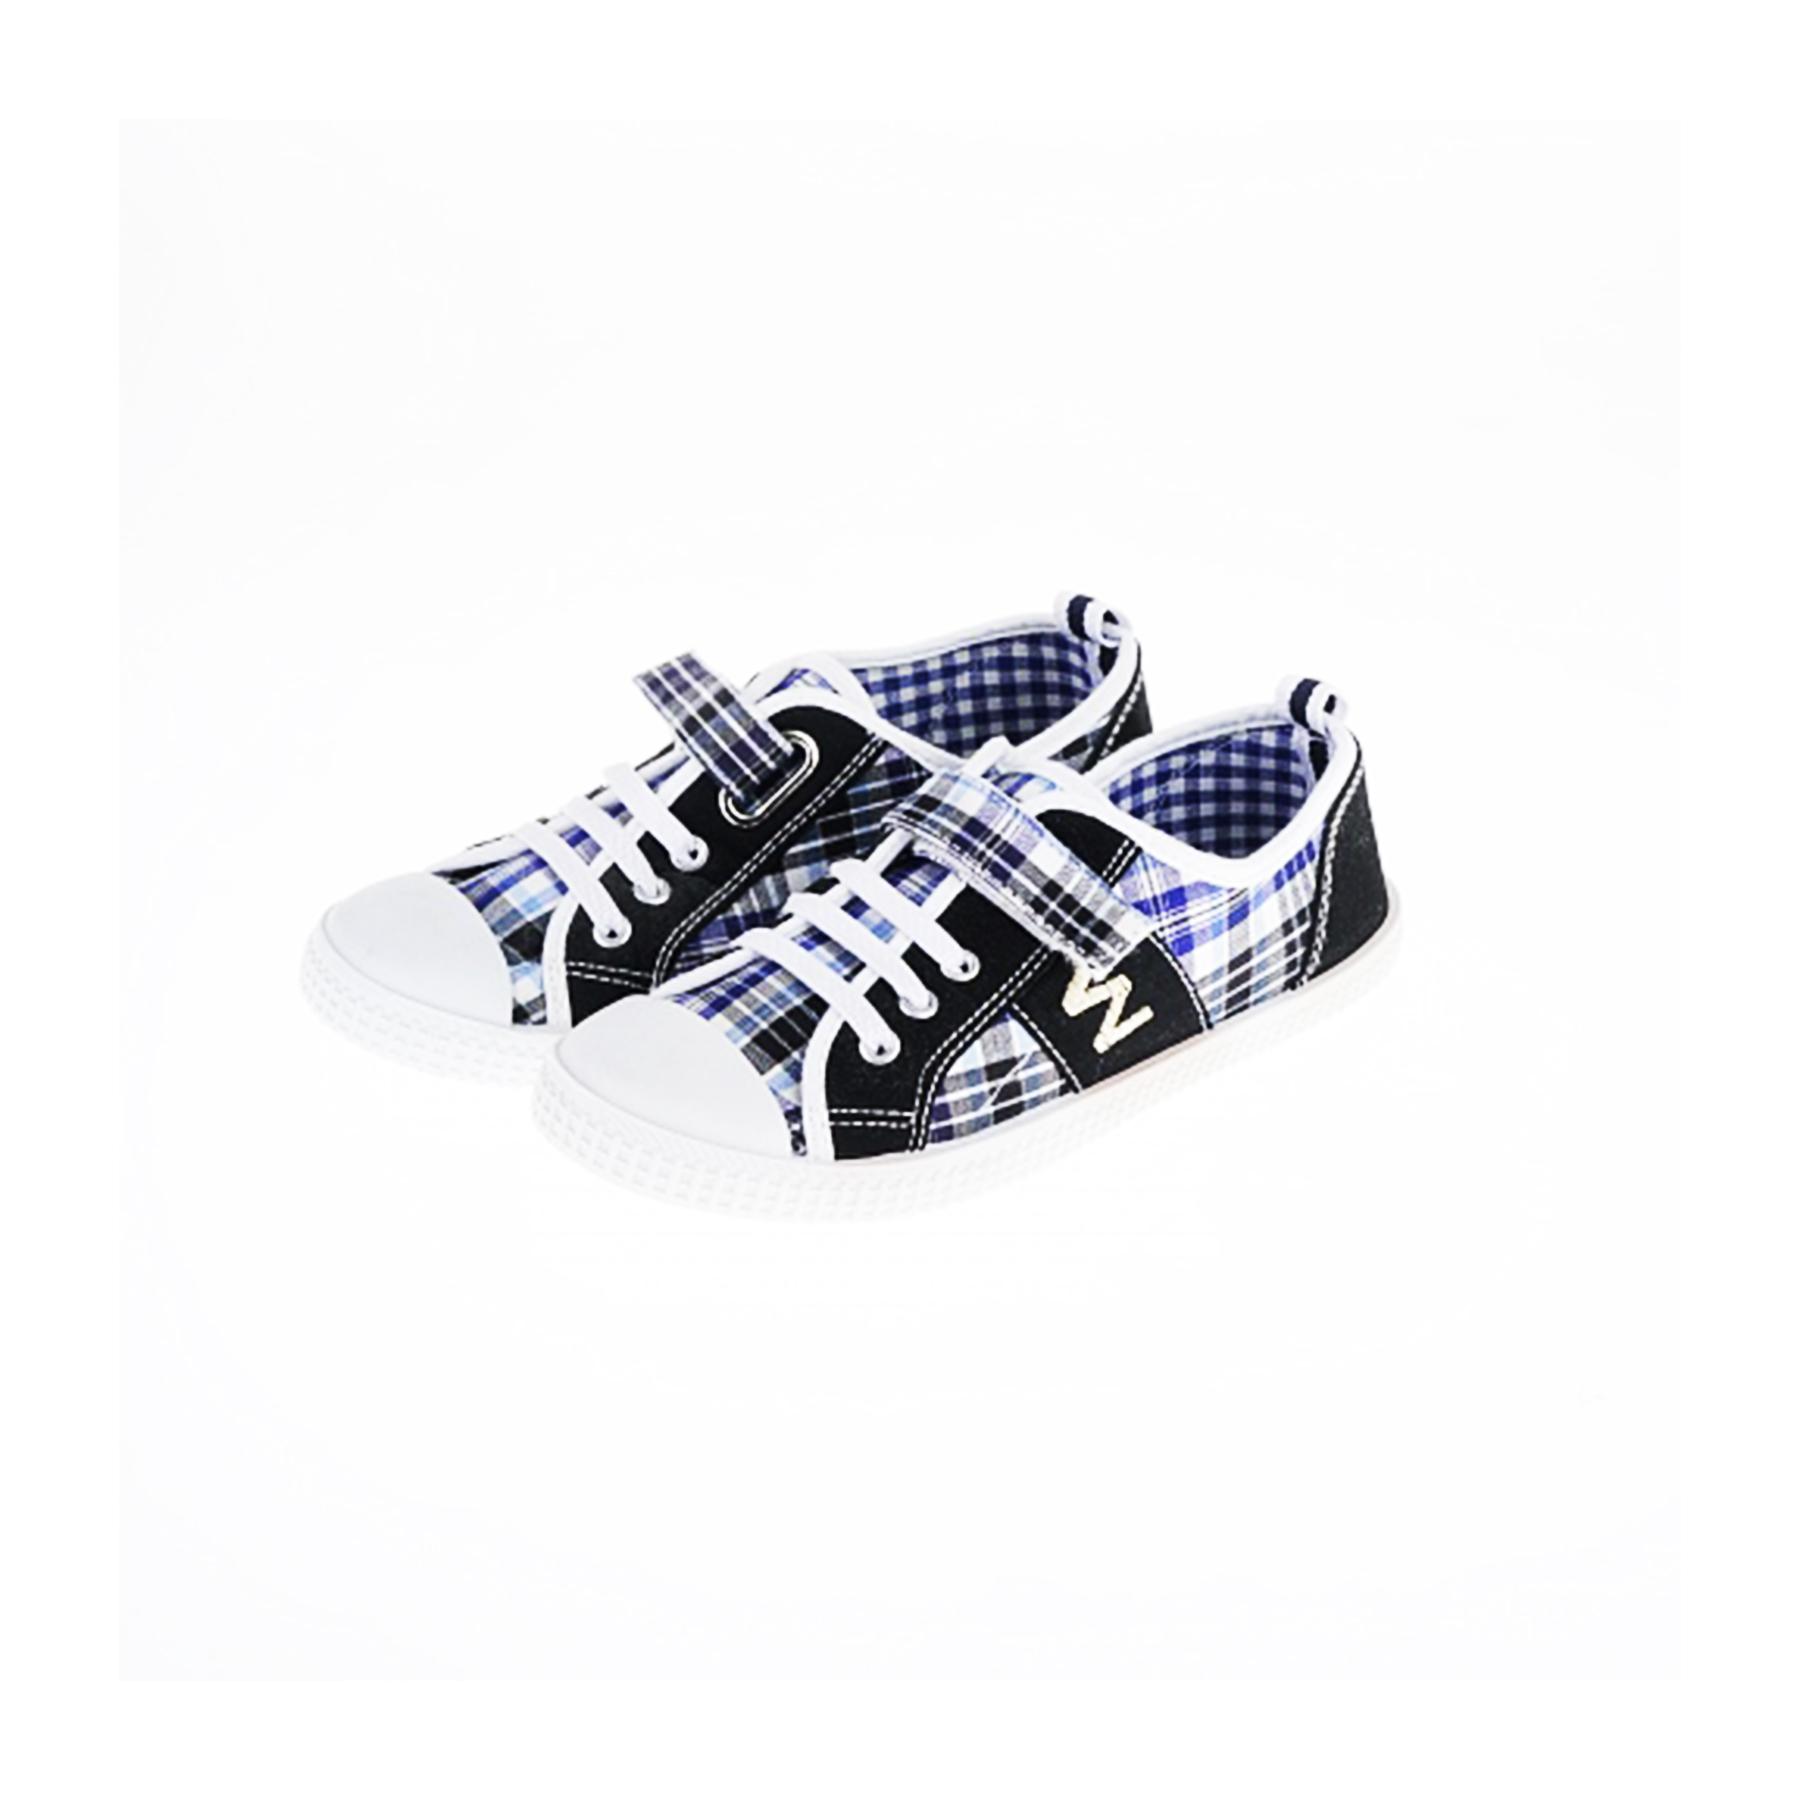 Обувь детская Trien  WJ 003-2 blue/black р. 35 черно-синие АКЦИЯ!